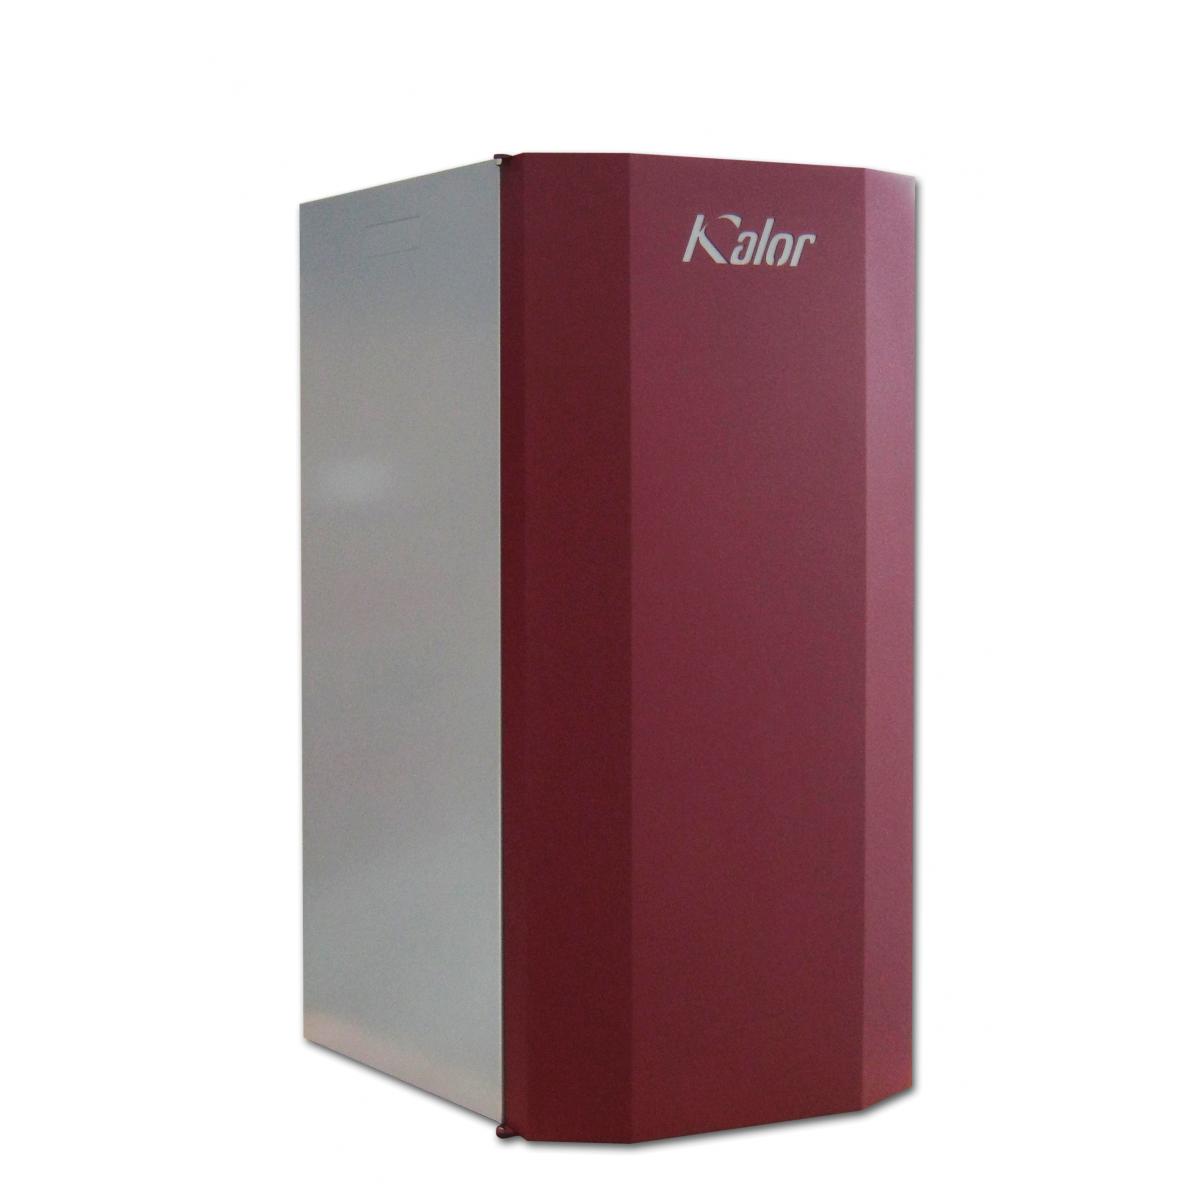 Caldaia idro a pellet Kalor 16 kw per riscaldamento radiatori hydro